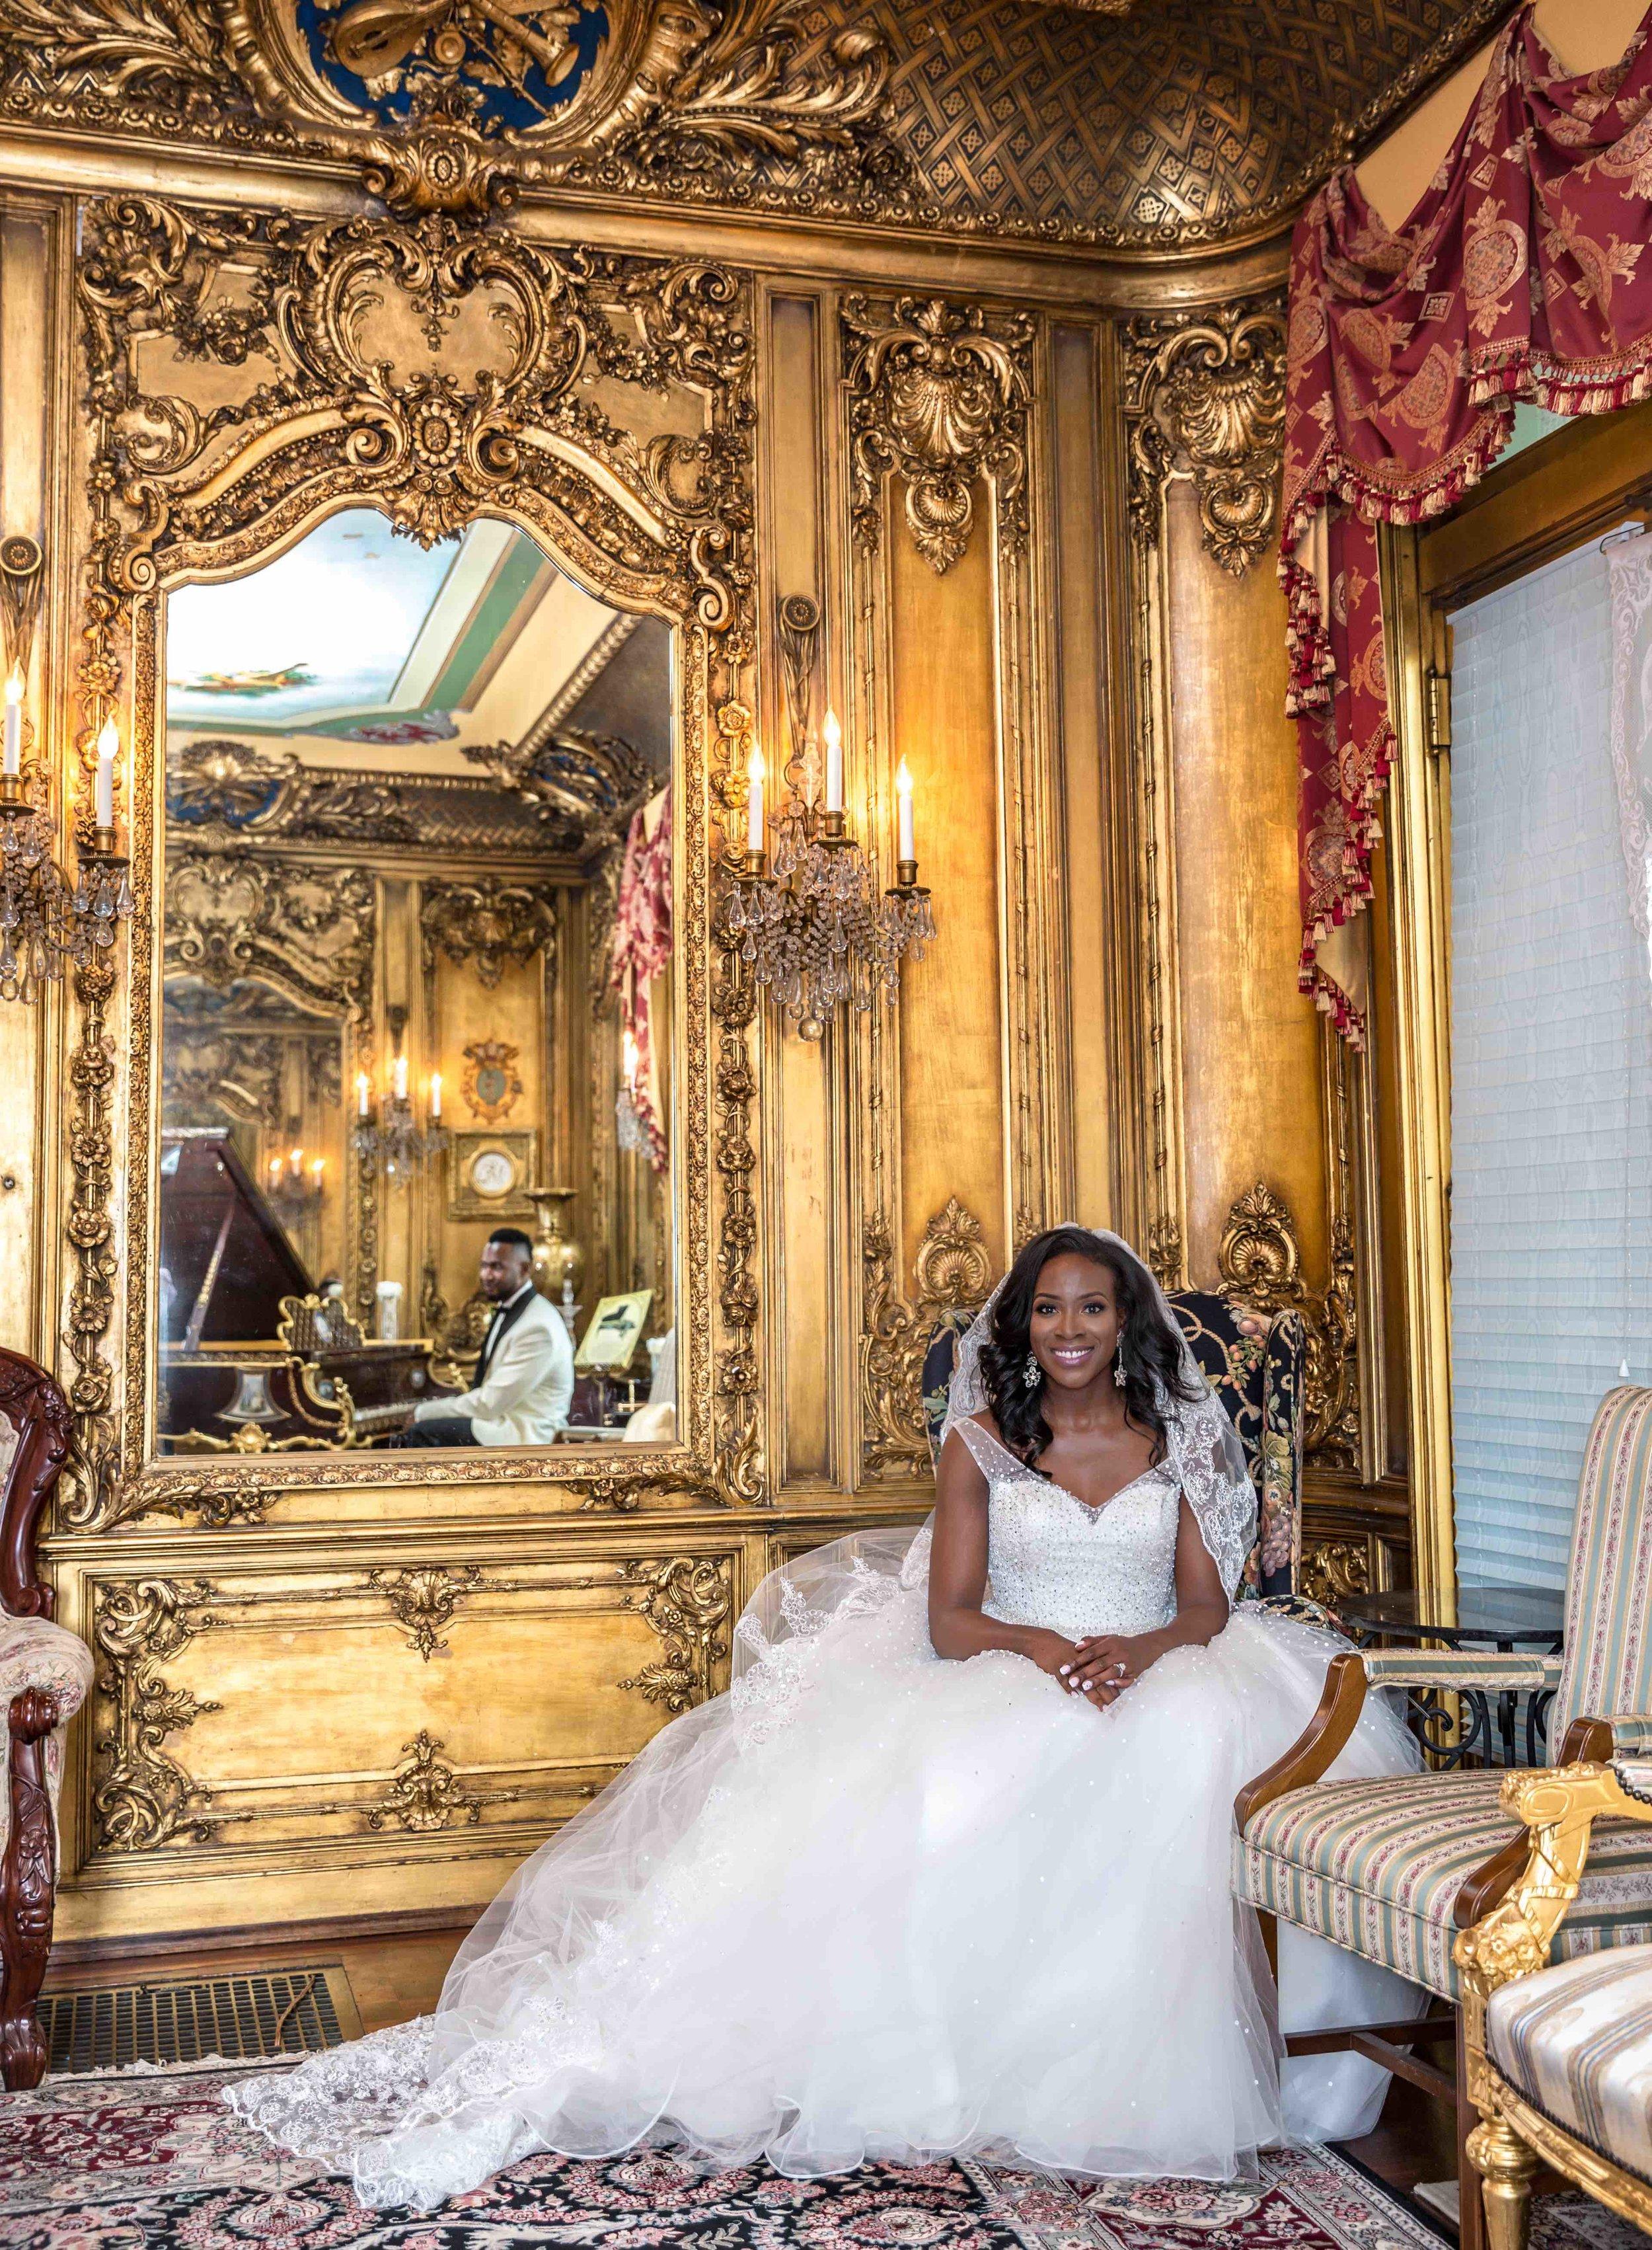 luxury_wedding_venue_cincinnati_european_african_american_couple